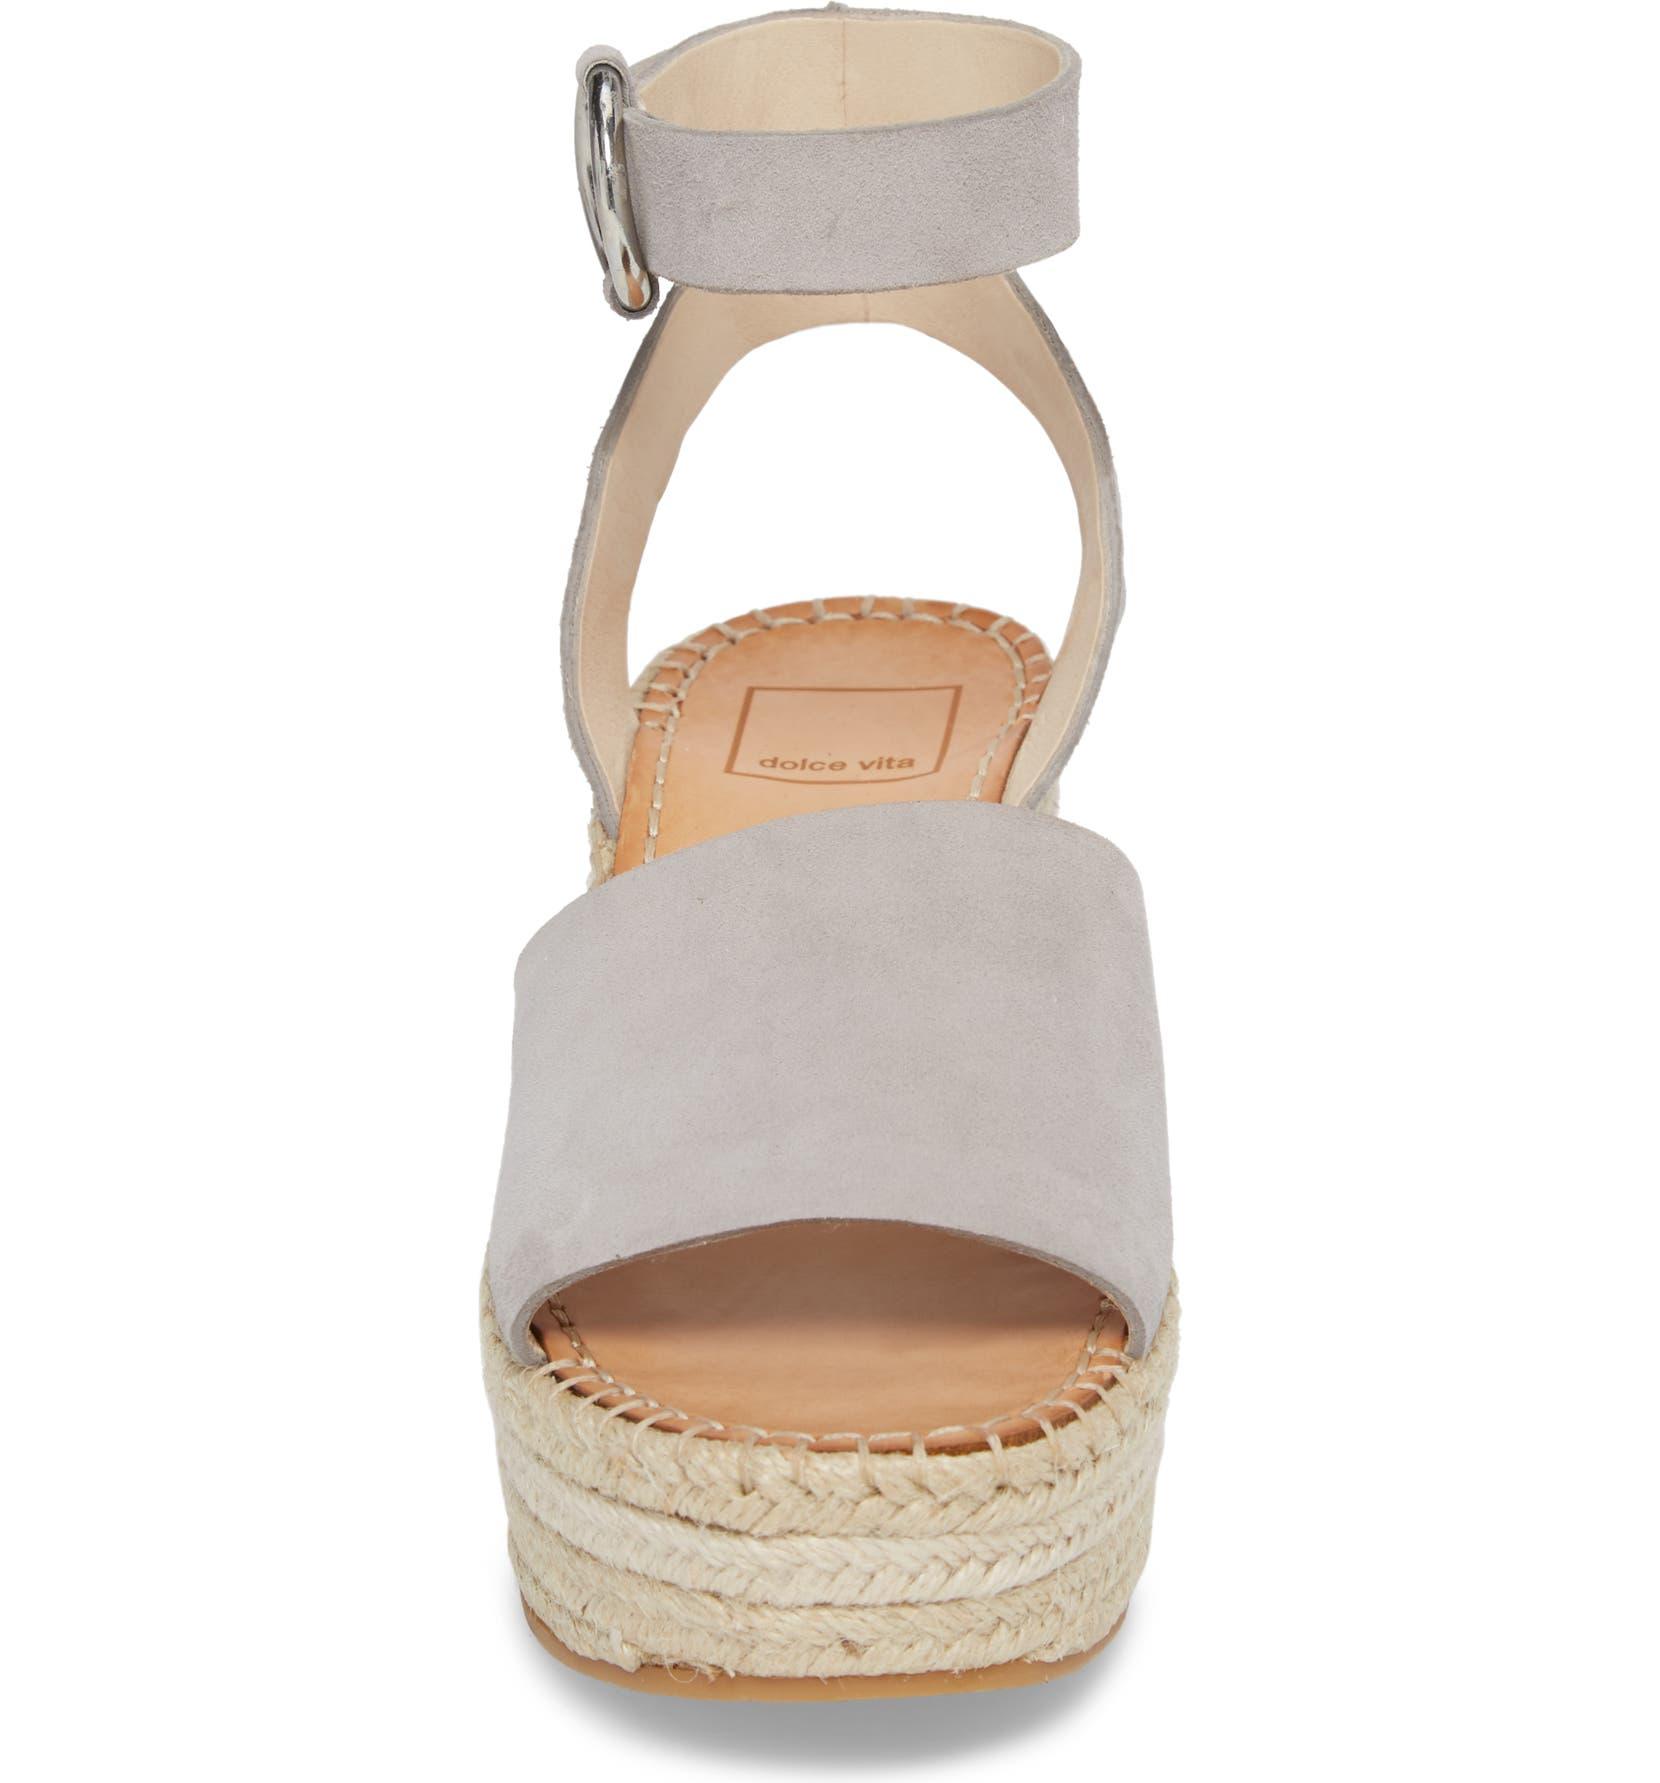 931e80e01a1 Lesly Espadrille Platform Sandal